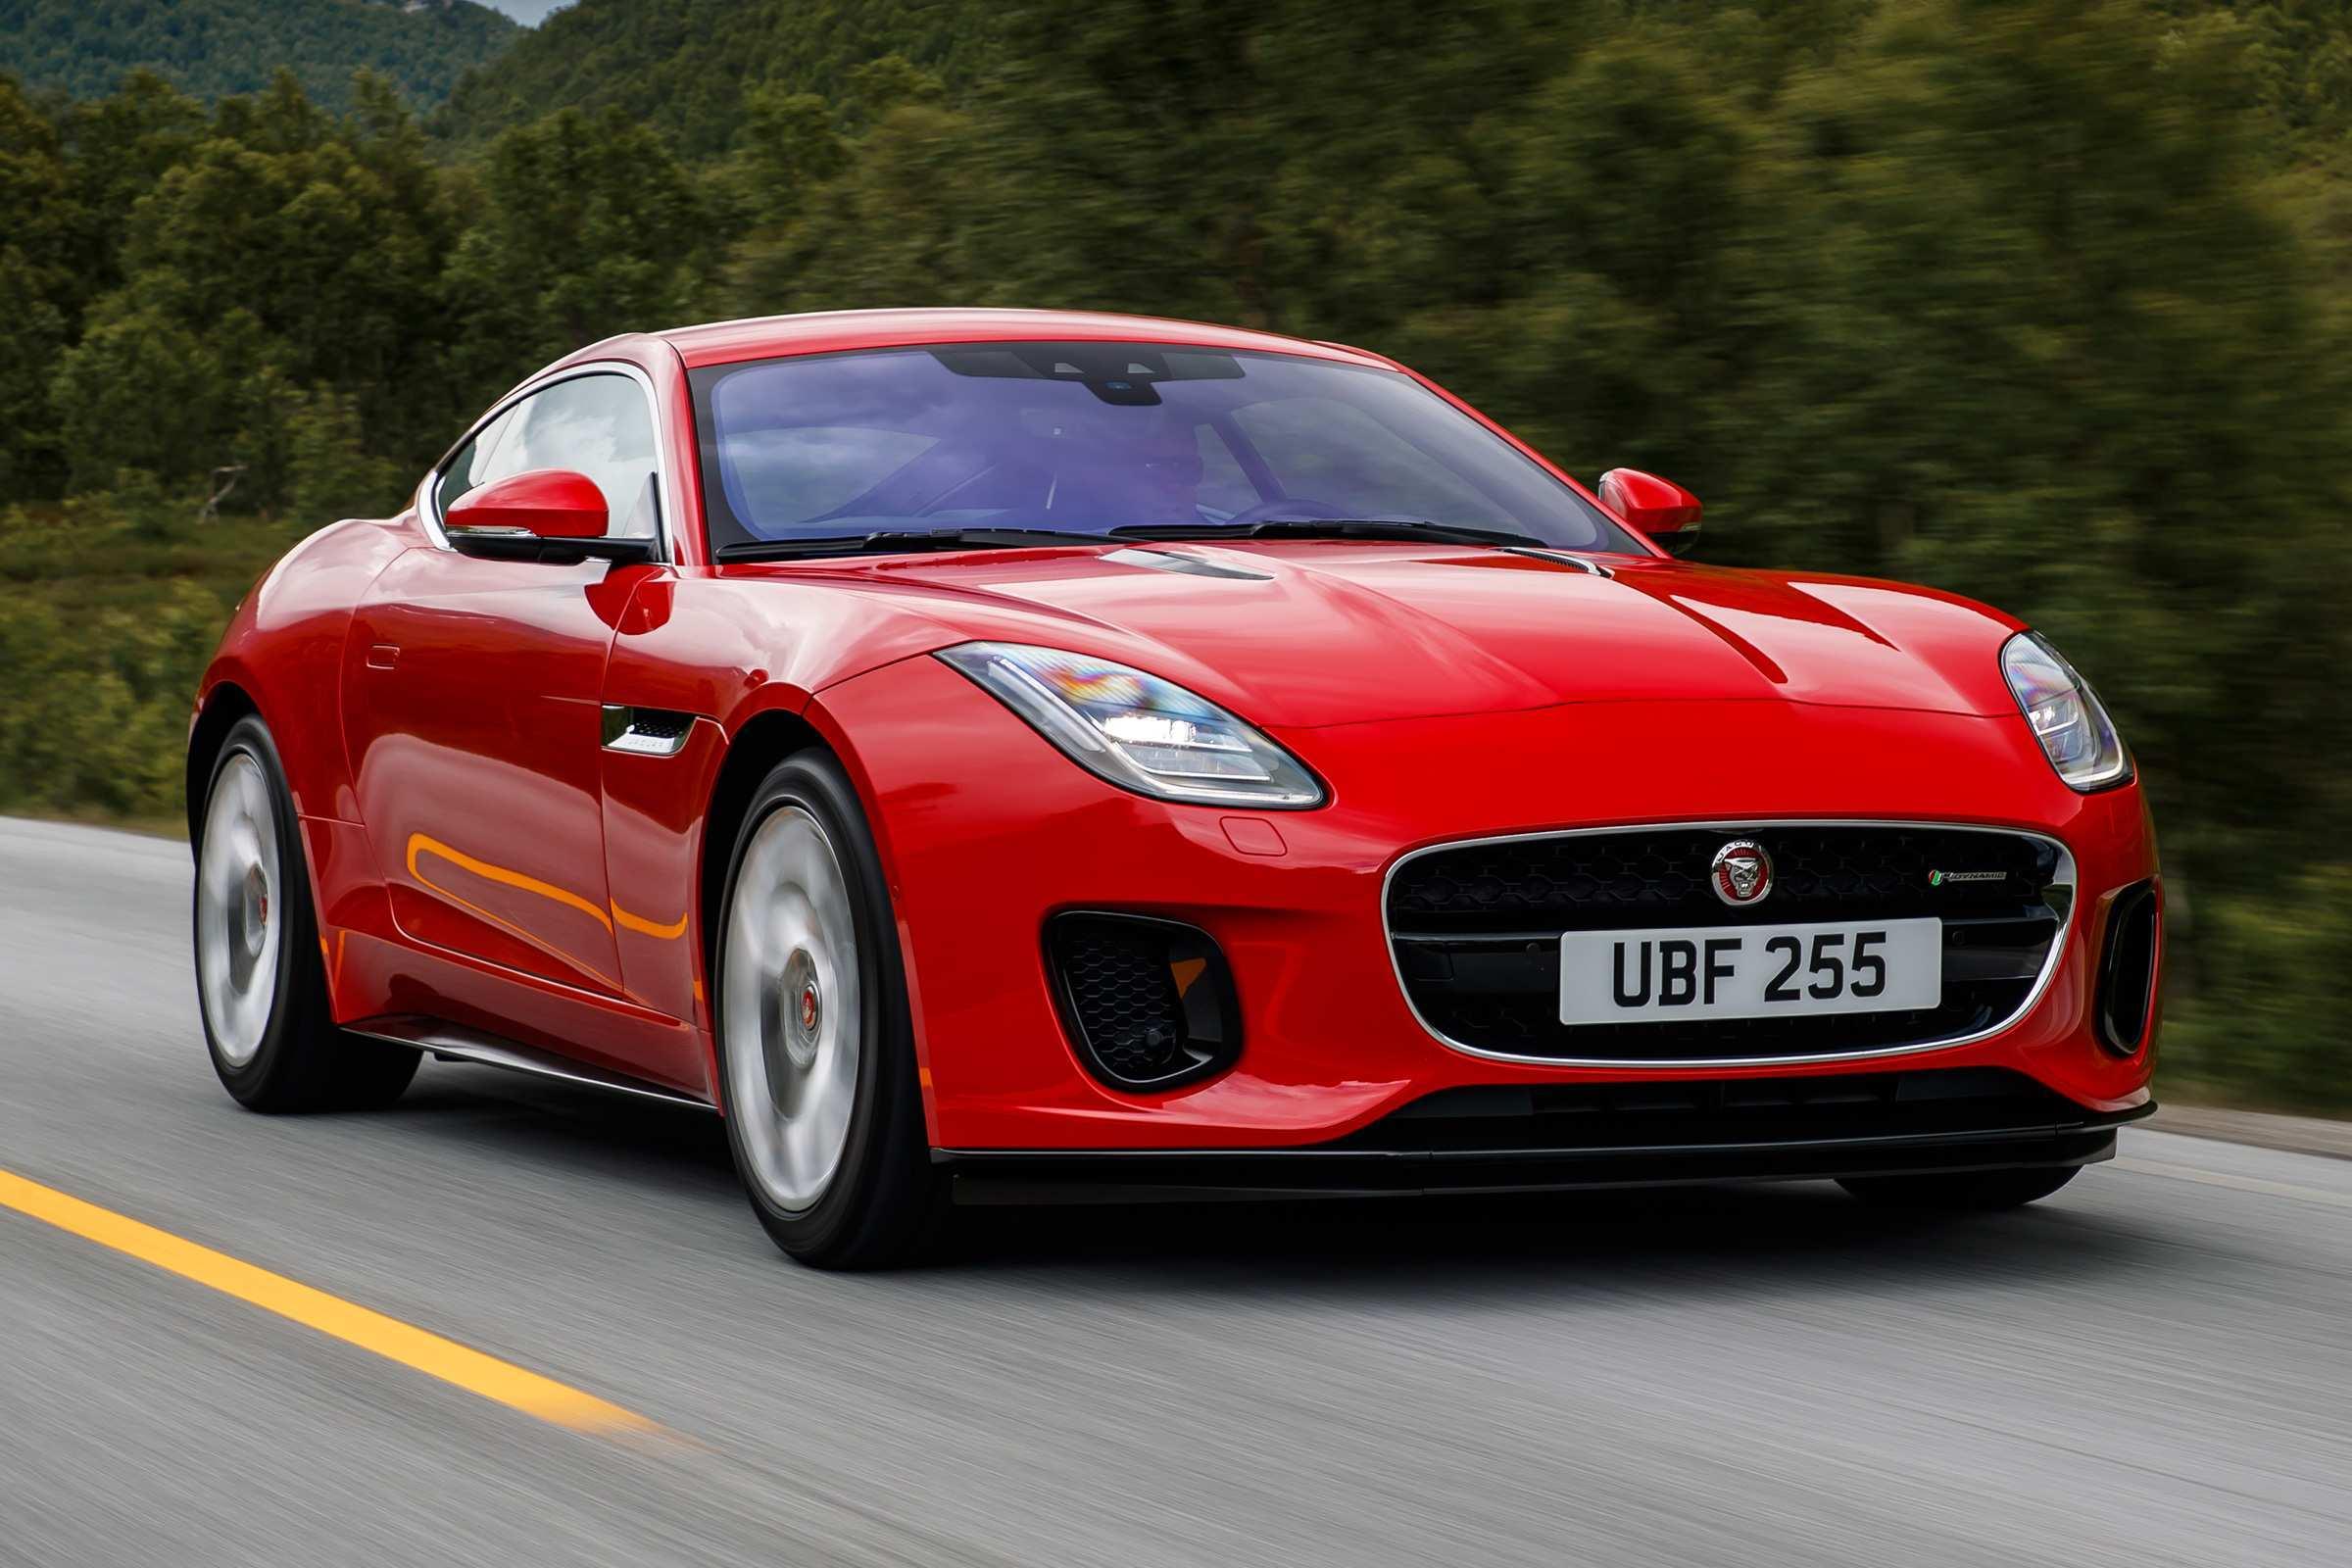 49 Great Jaguar F Type 2019 Review Spy Shoot with Jaguar F Type 2019 Review